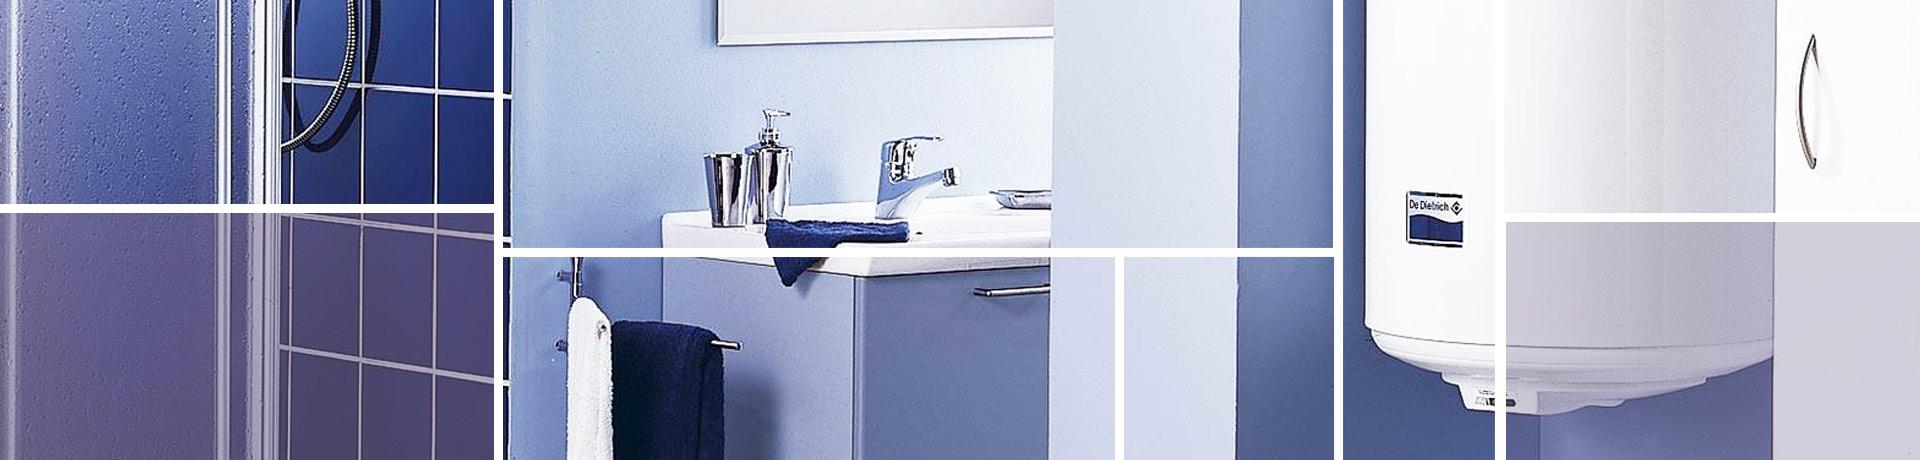 chauffe eau marseille bernhart entreprise. Black Bedroom Furniture Sets. Home Design Ideas